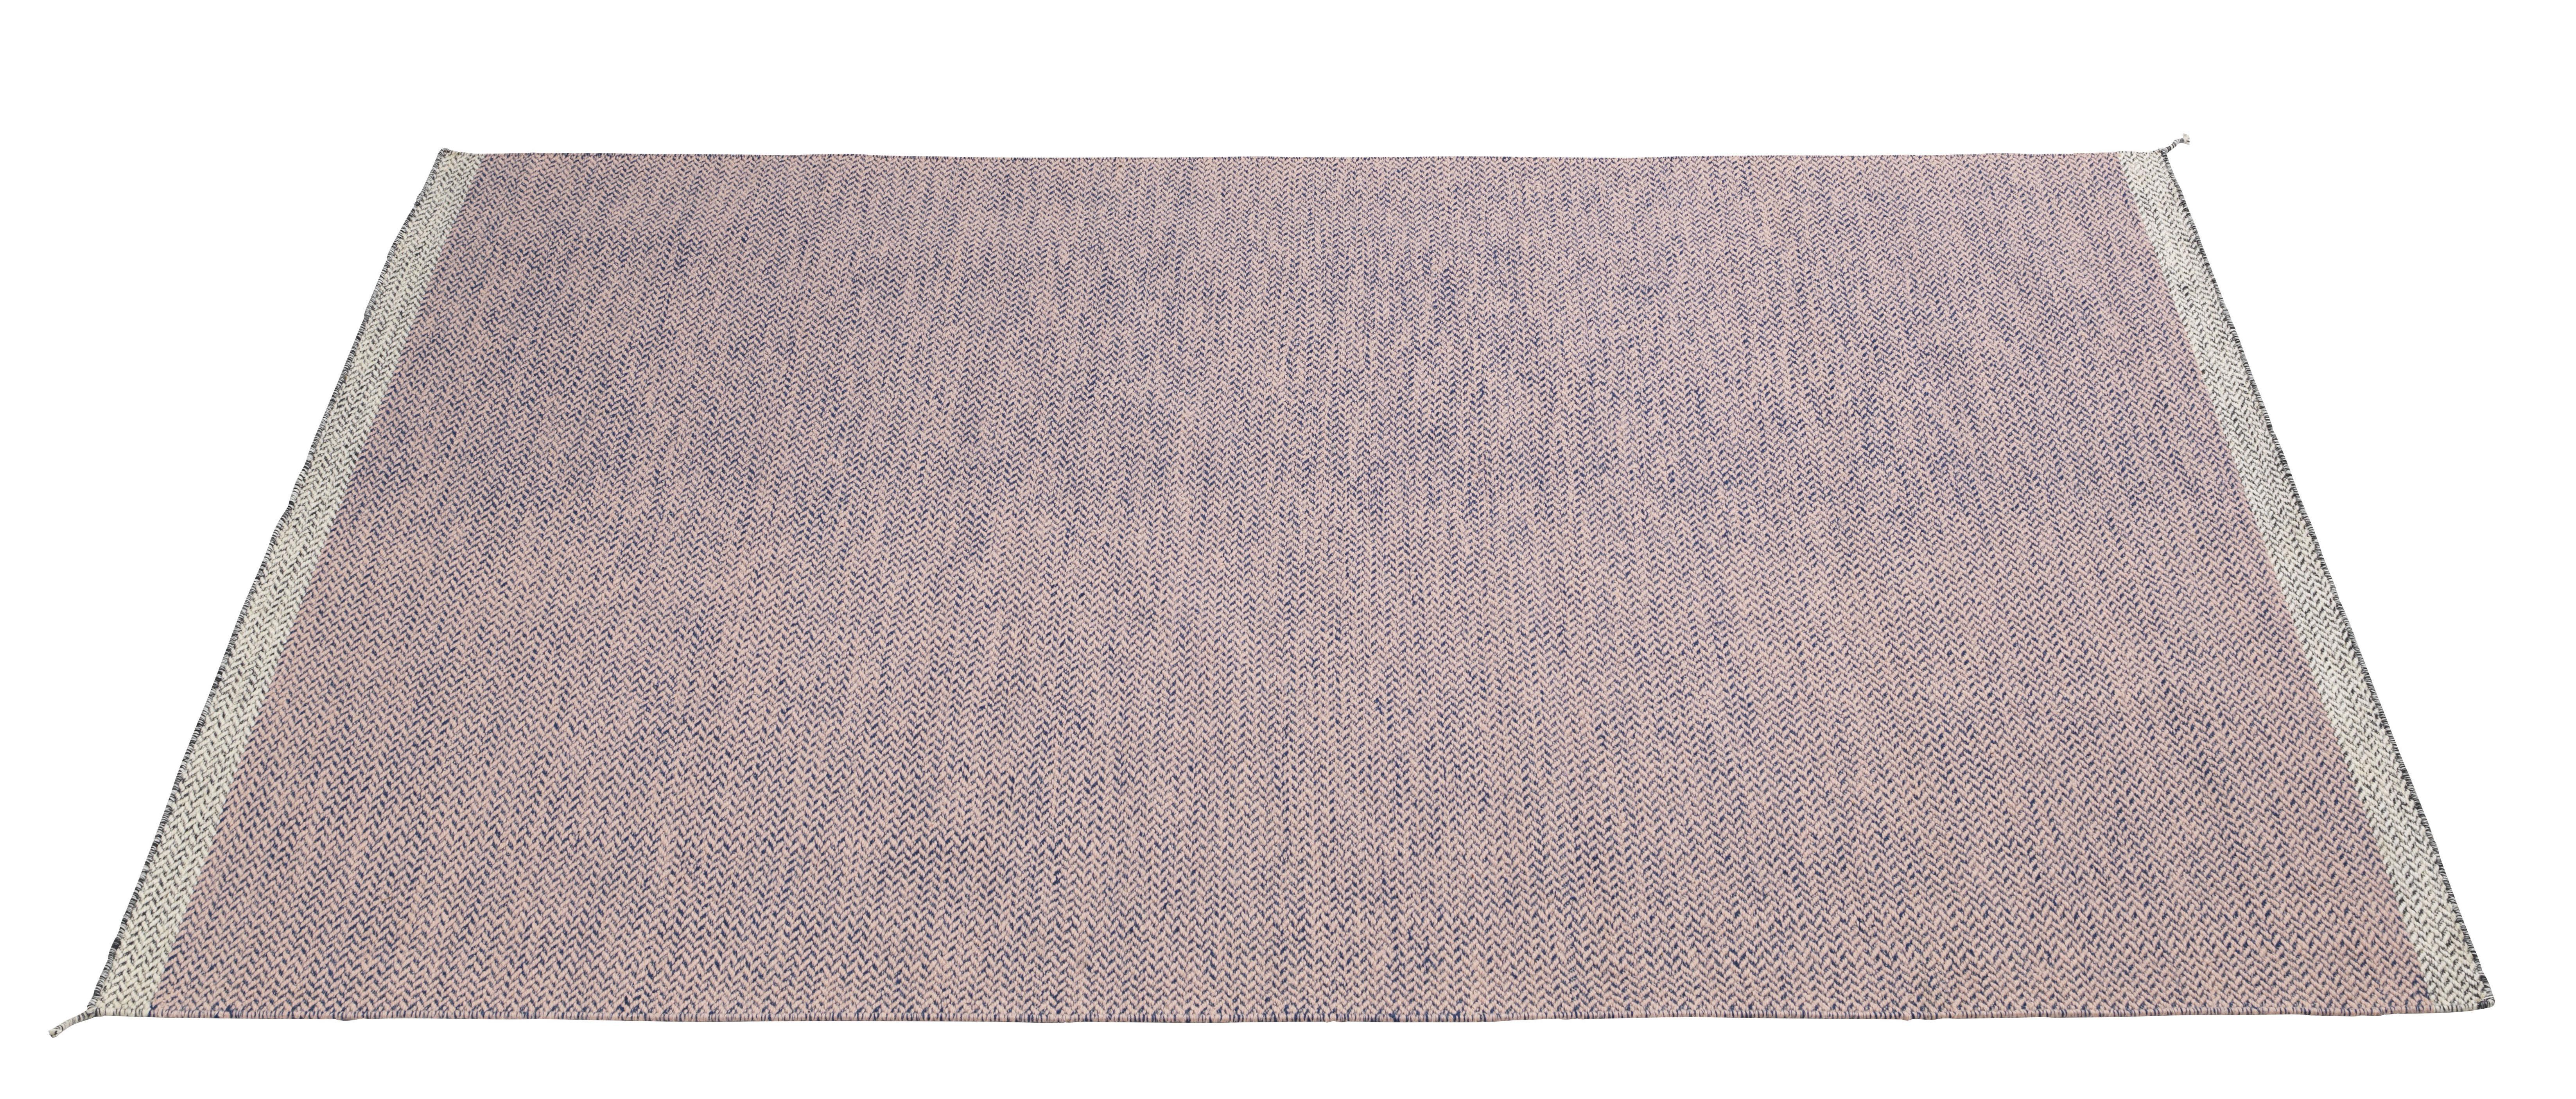 tapis ply 200 x 300 cm tiss main rose muuto. Black Bedroom Furniture Sets. Home Design Ideas